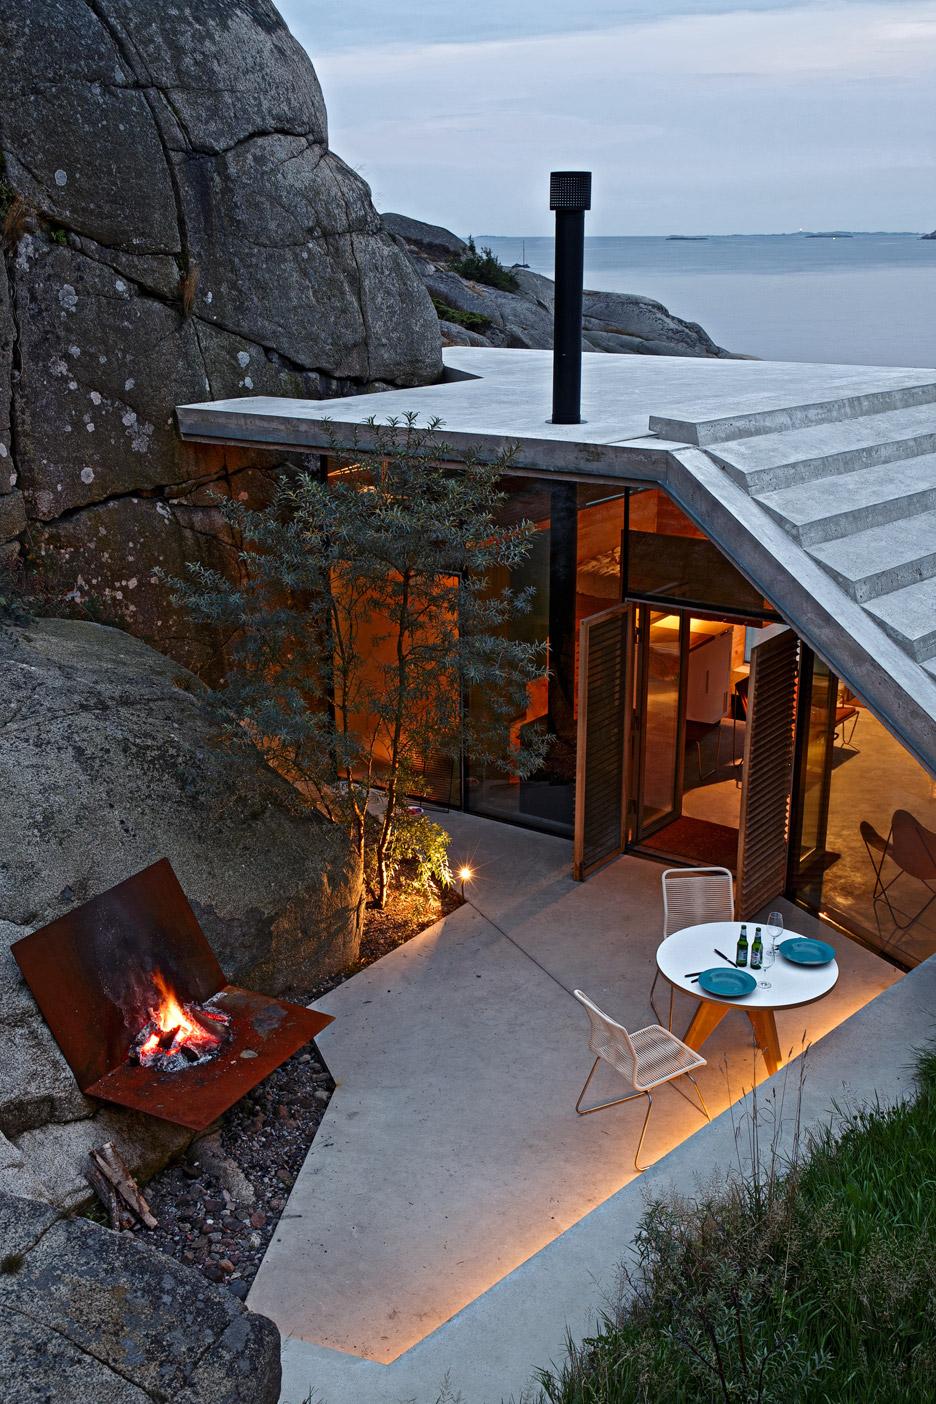 cabin-knapphullet-lund-hagem-kim-muller-photography-sandefjord-norway_dezeen_936_14